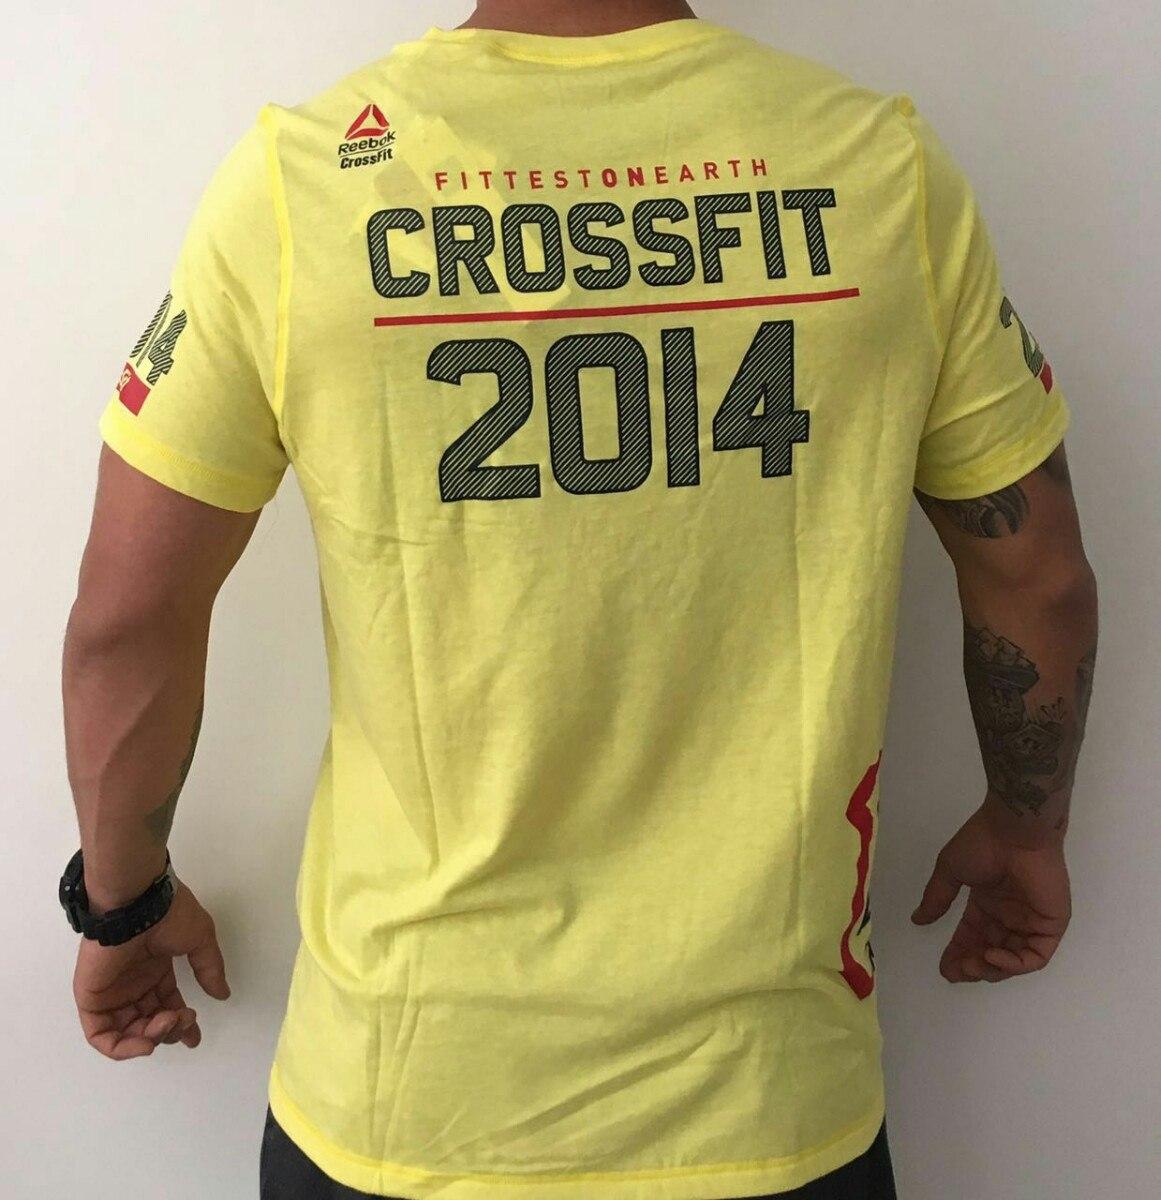 b6c7851c9 camiseta reebok crossfit games 2014 competidor tamanho g. Carregando zoom.